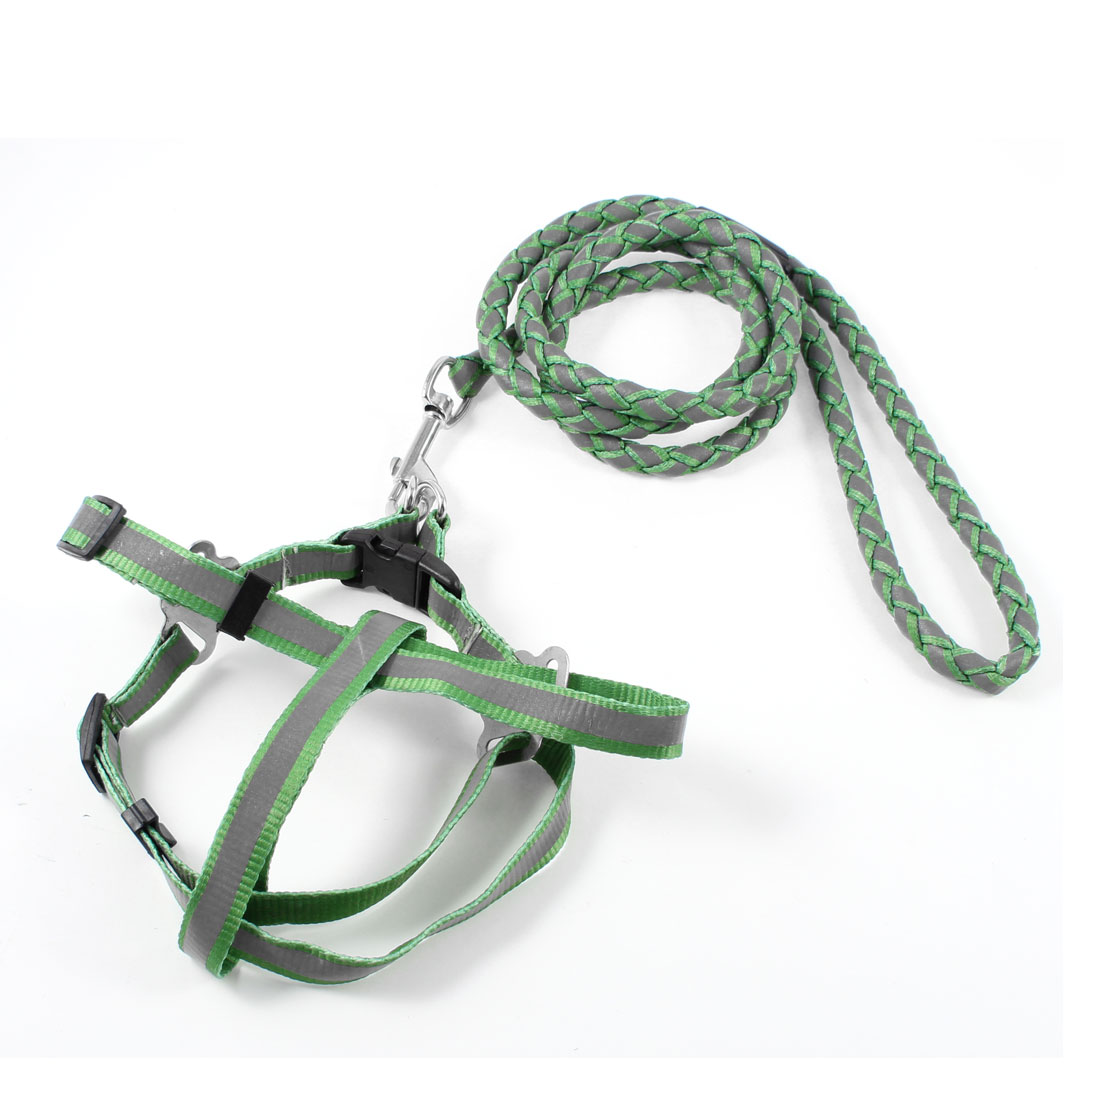 "0.4"" Dia Braided Nylon Rope Reflective Pet Dog Harness Leash Green Gray"